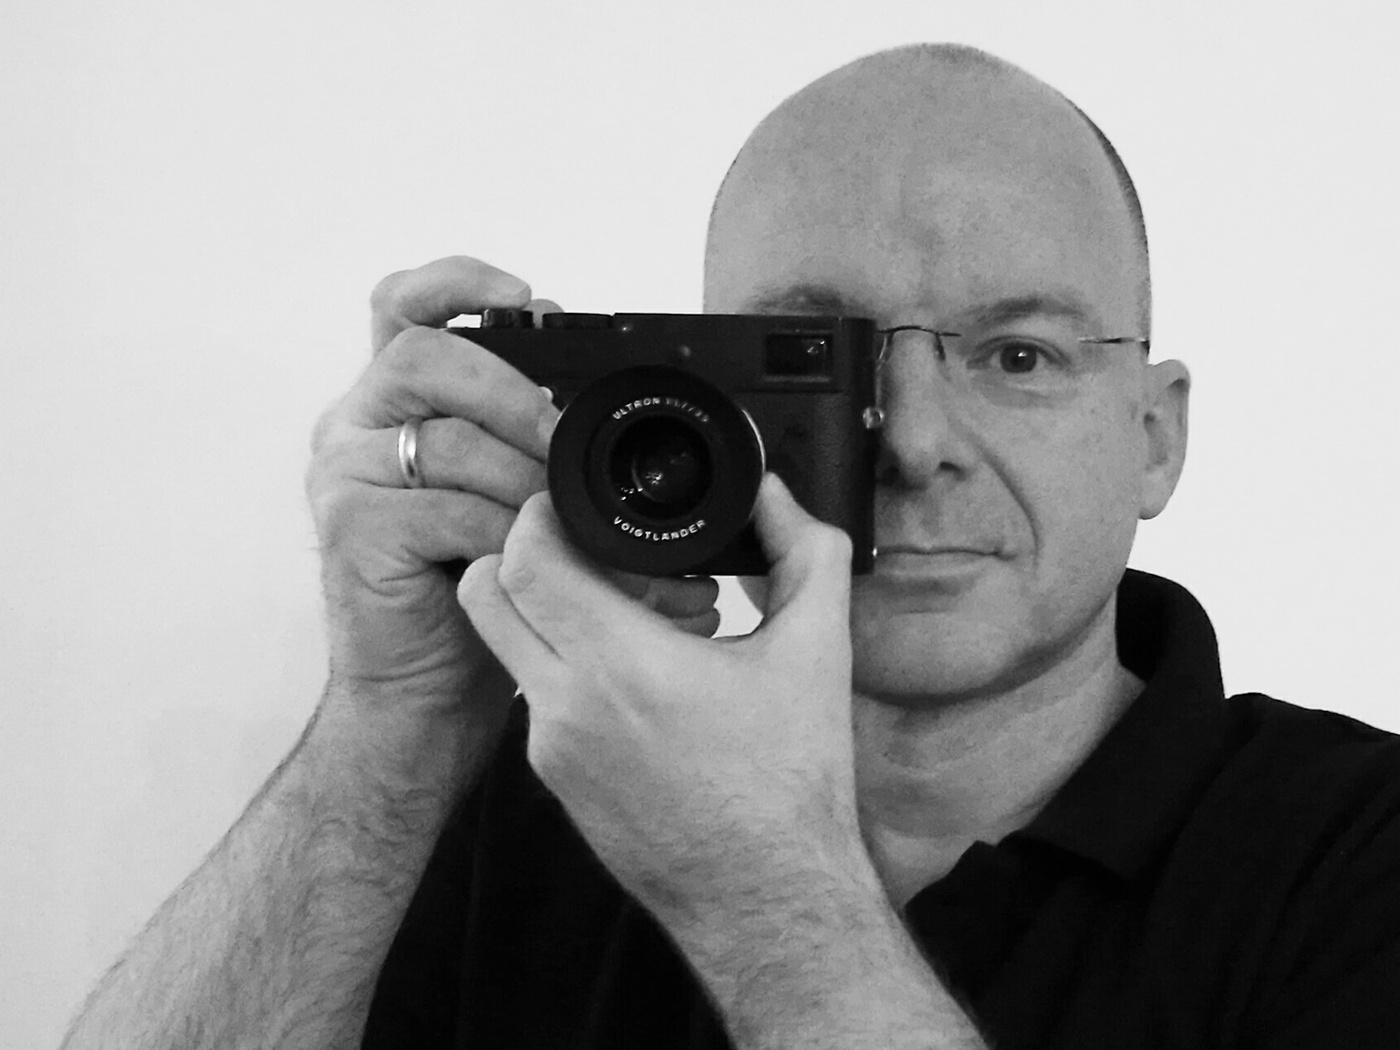 Fotografie mit Michel Birnbacher - Leica M Enthusiast